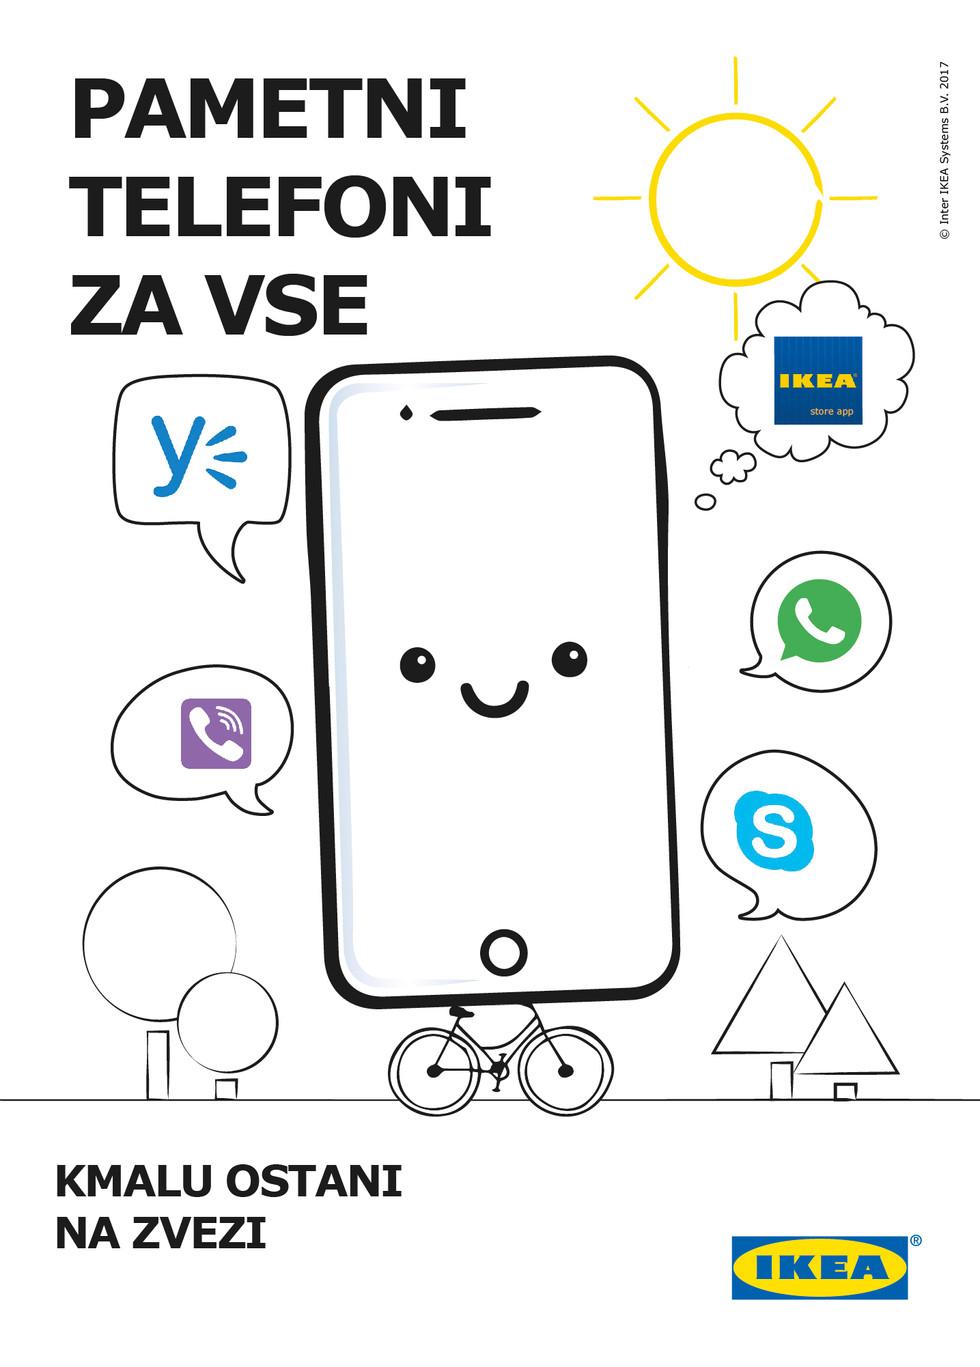 IKEA Smartphones Campaign Visual Identity